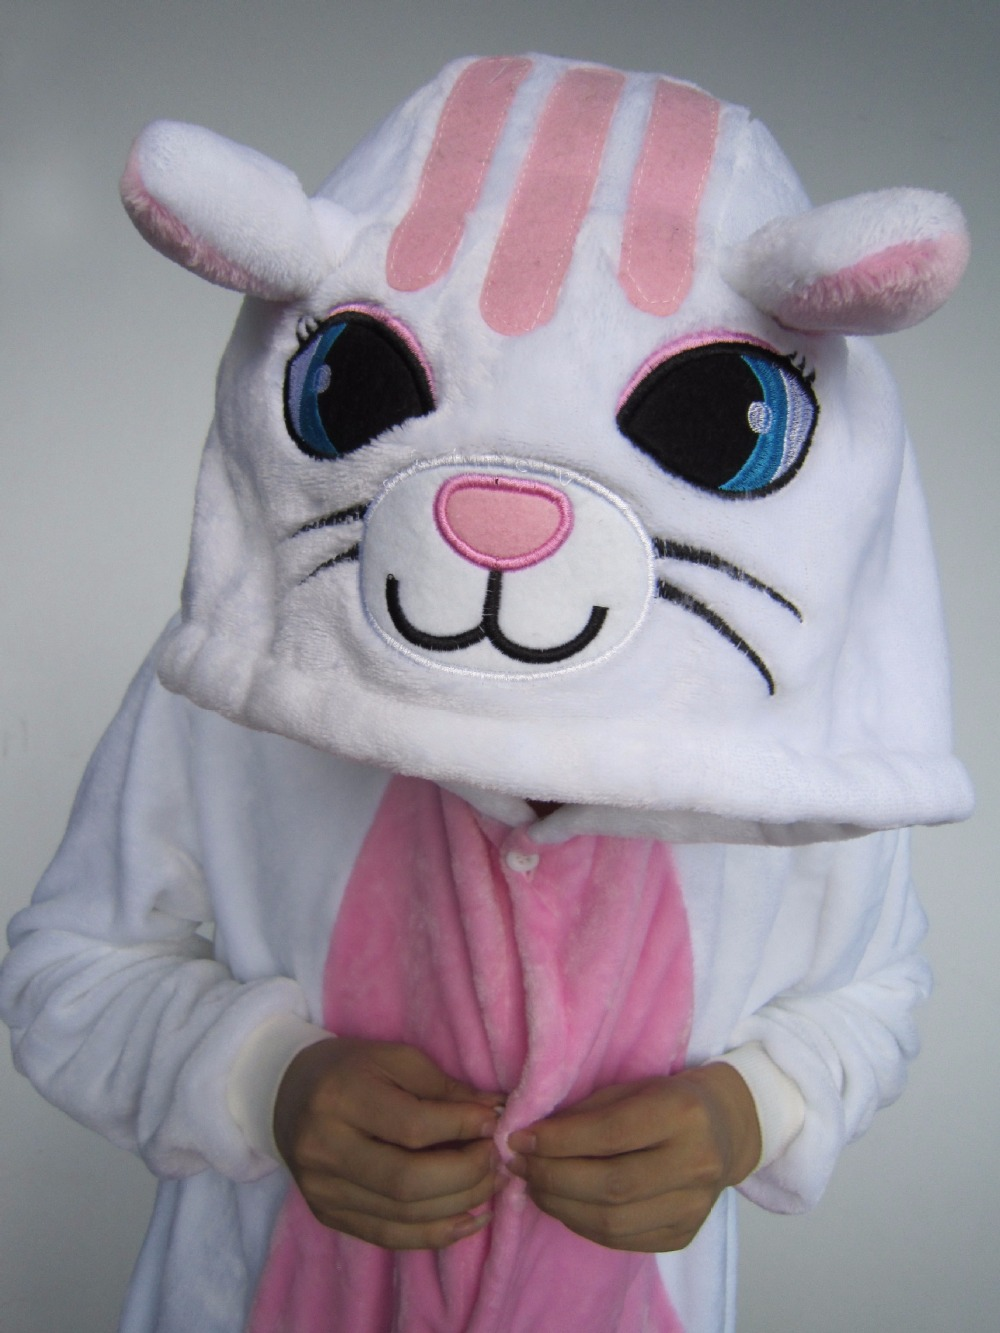 Cartoon animal serial pajamas new white cat big face cat cute casual cartoon home clothes.